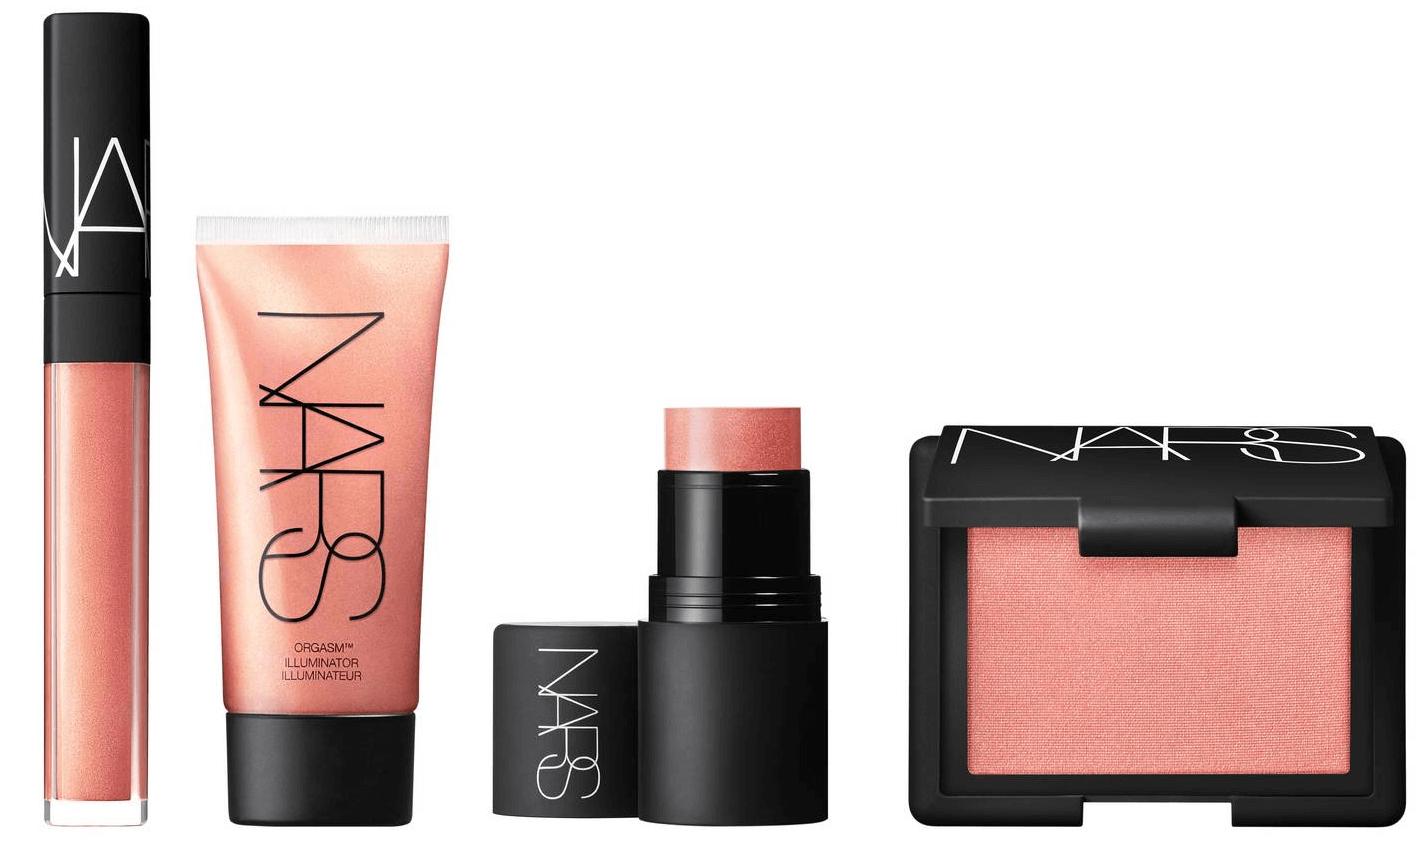 blush-orgasm-rouge-a-levres-illuminateur-highlighter-rosegold-nars-sephora-makeupbyazadig